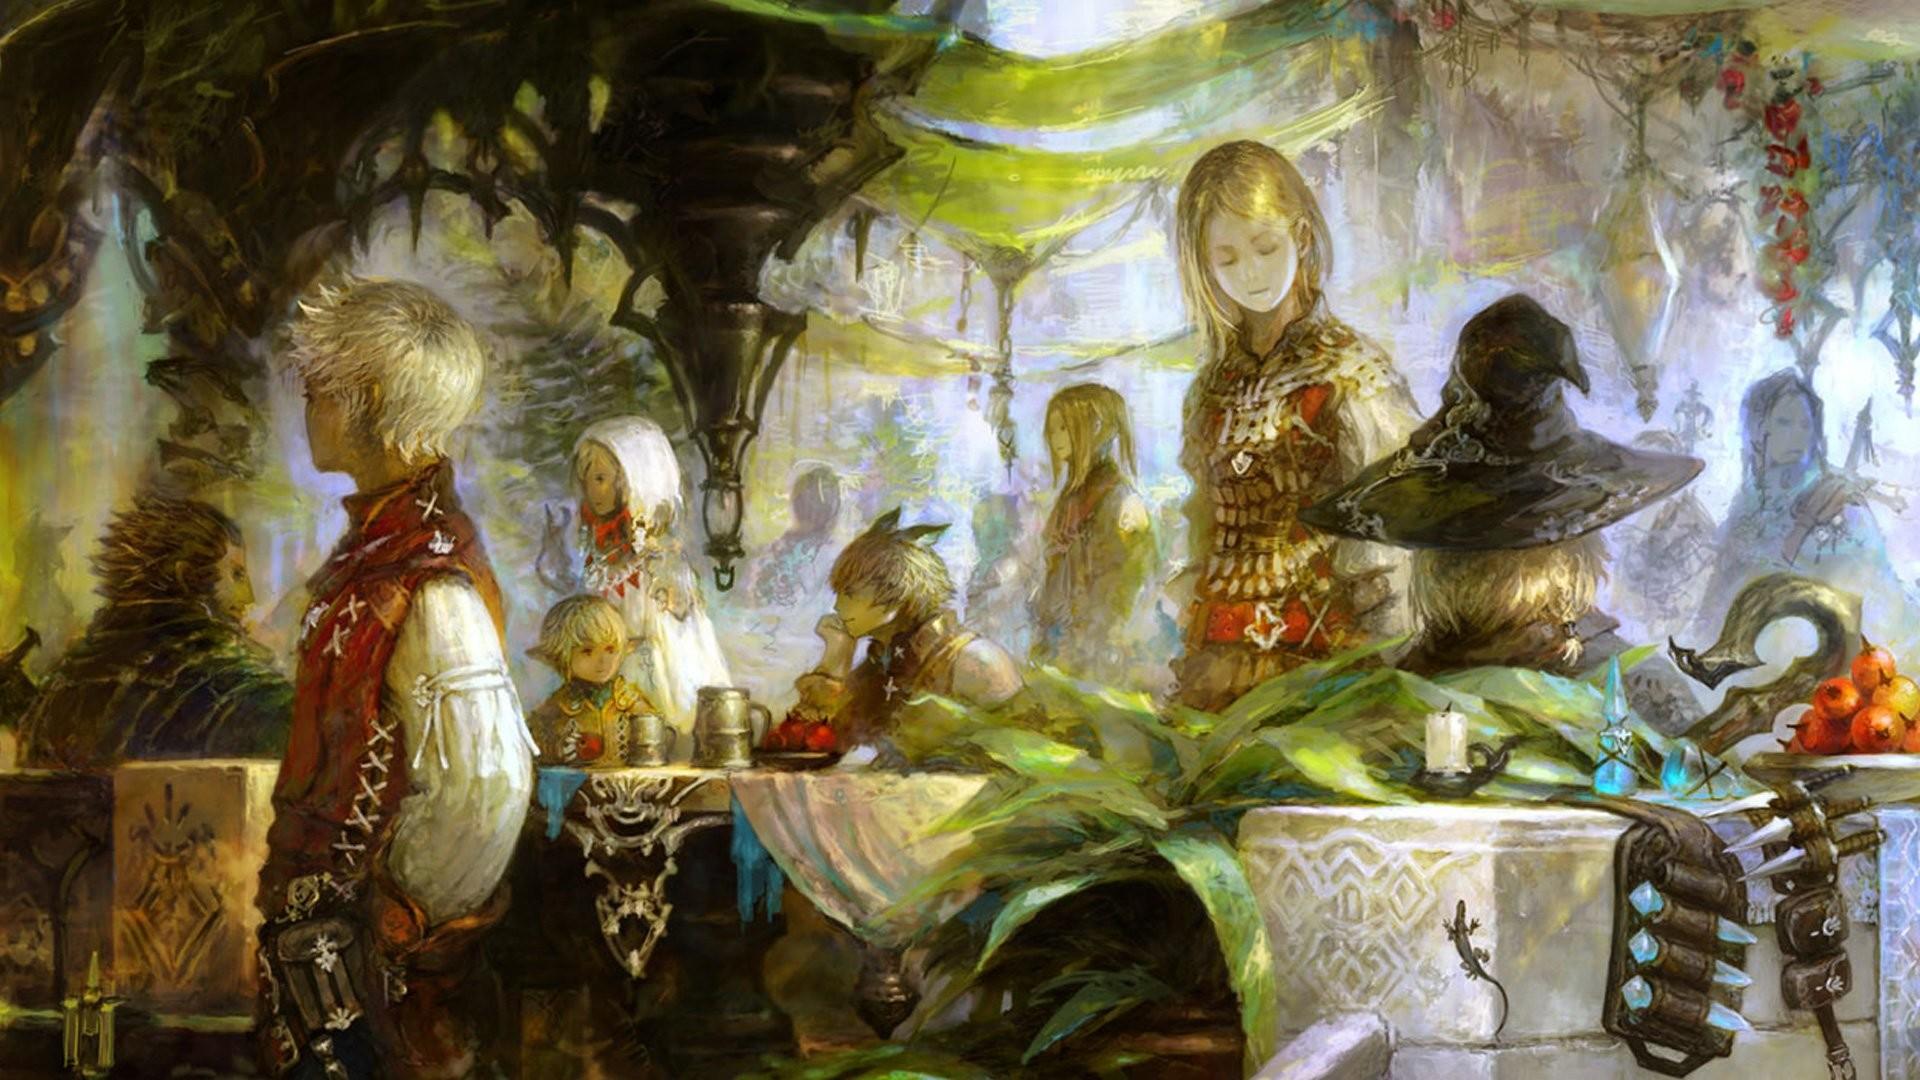 Final Fantasy Xiv Concept Art 421126